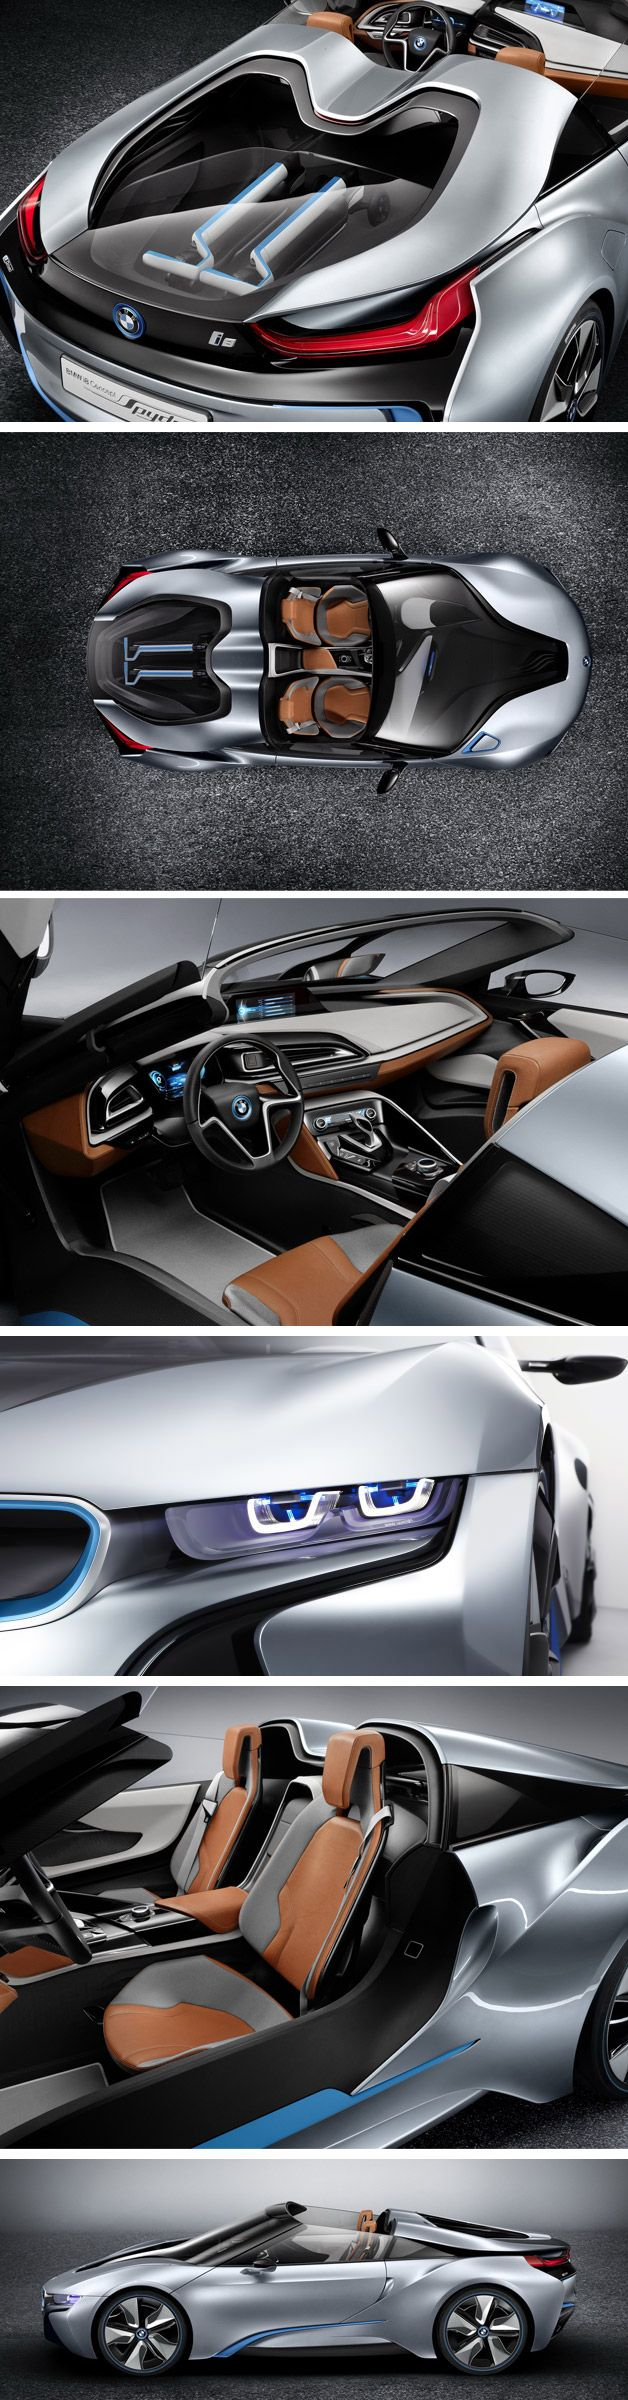 BMW i8 Spyder, very nice.